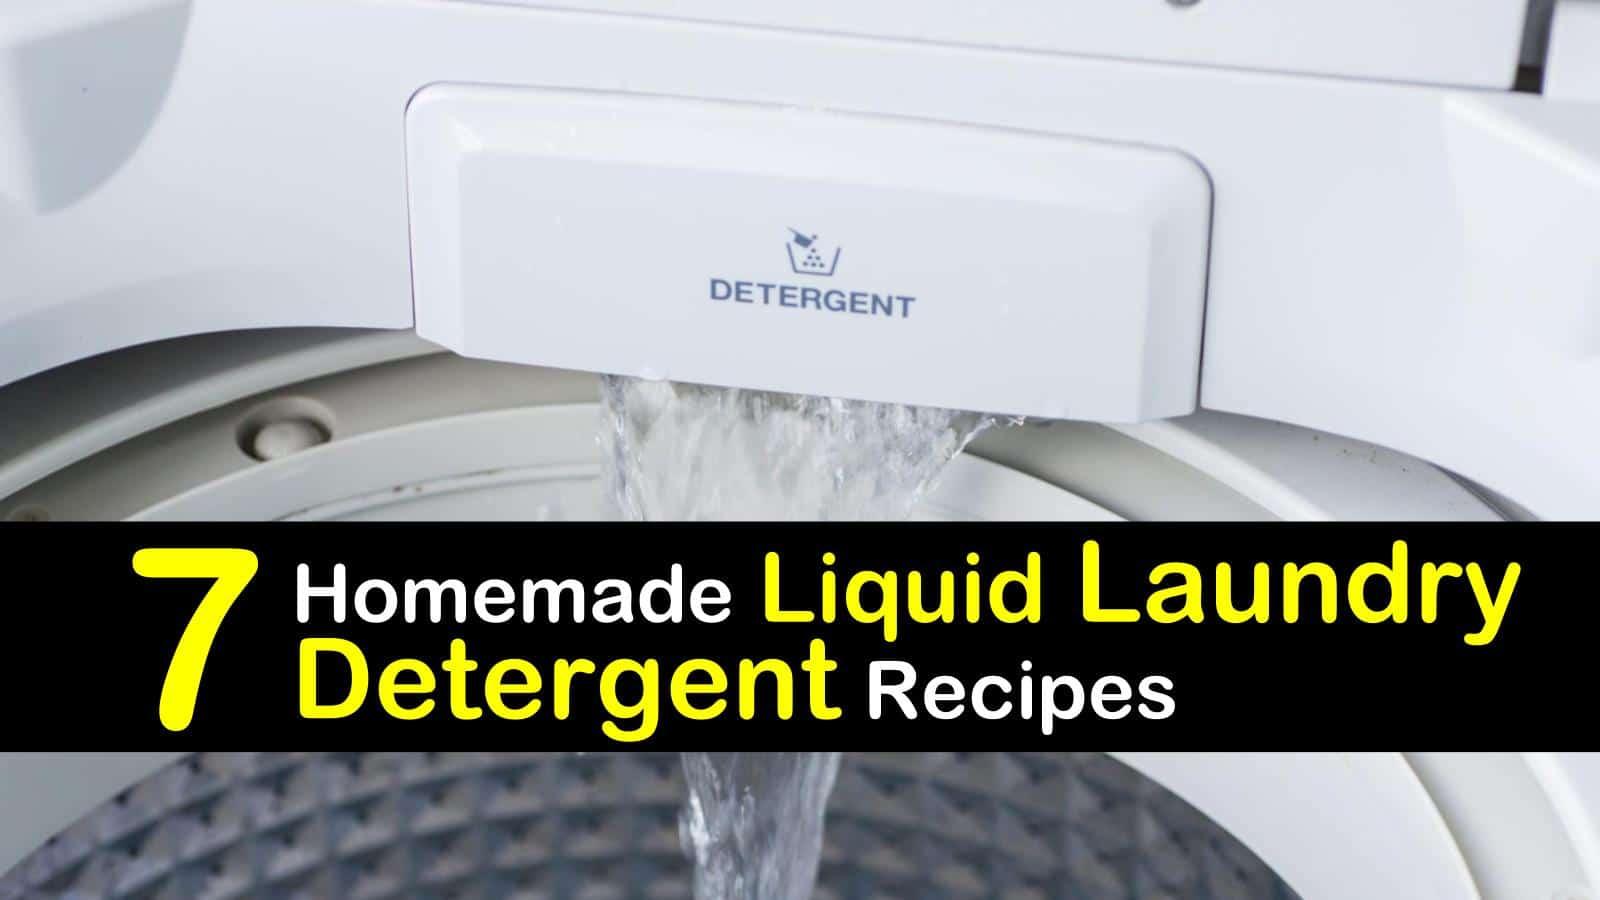 DIY Liquid Laundry Soap – 7 Homemade Liquid Laundry Detergent Recipes